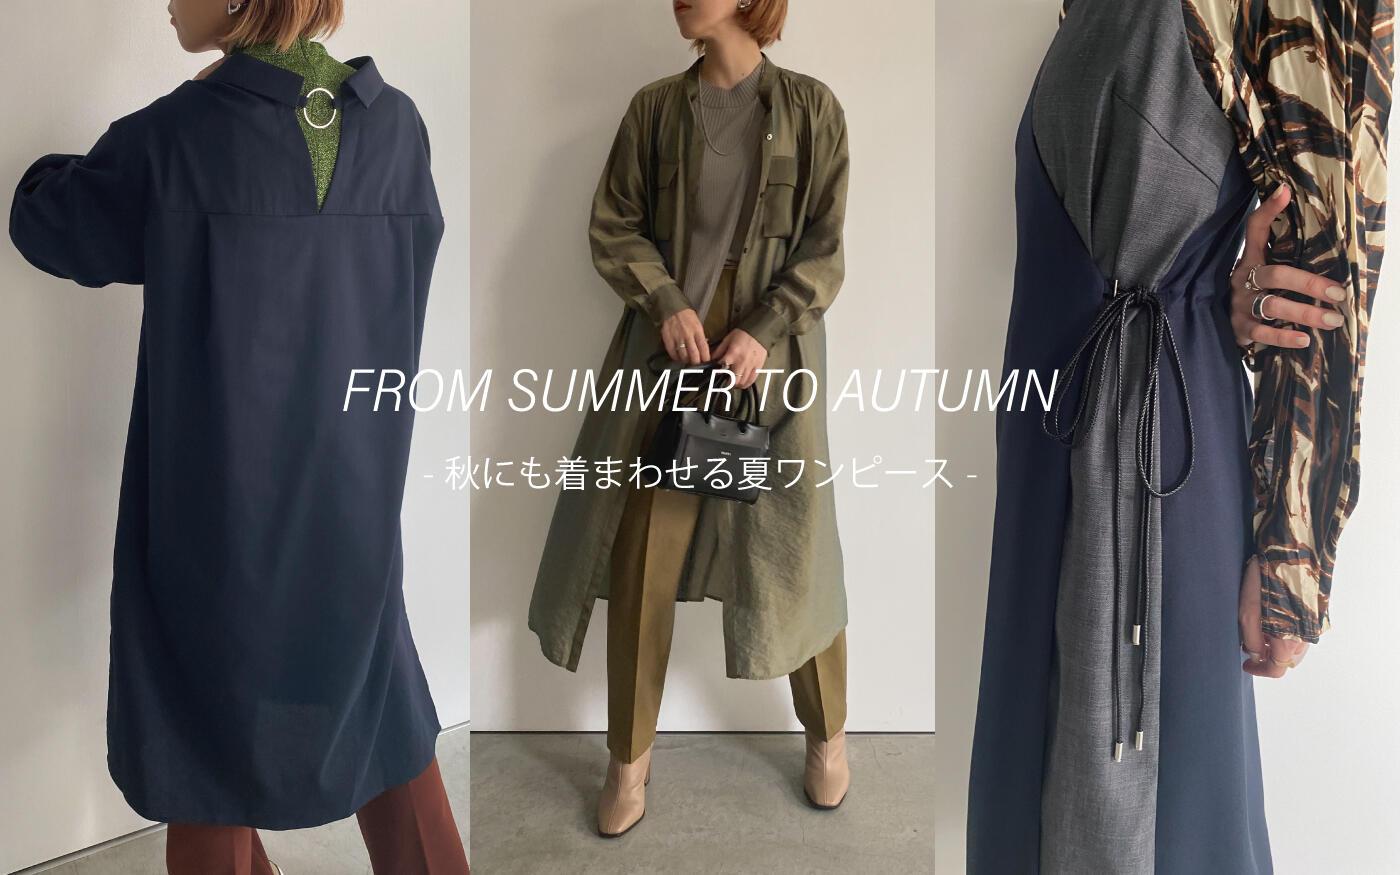 FROM SUMMER TO AUTUMN -秋にも着まわせる夏ワンピース-